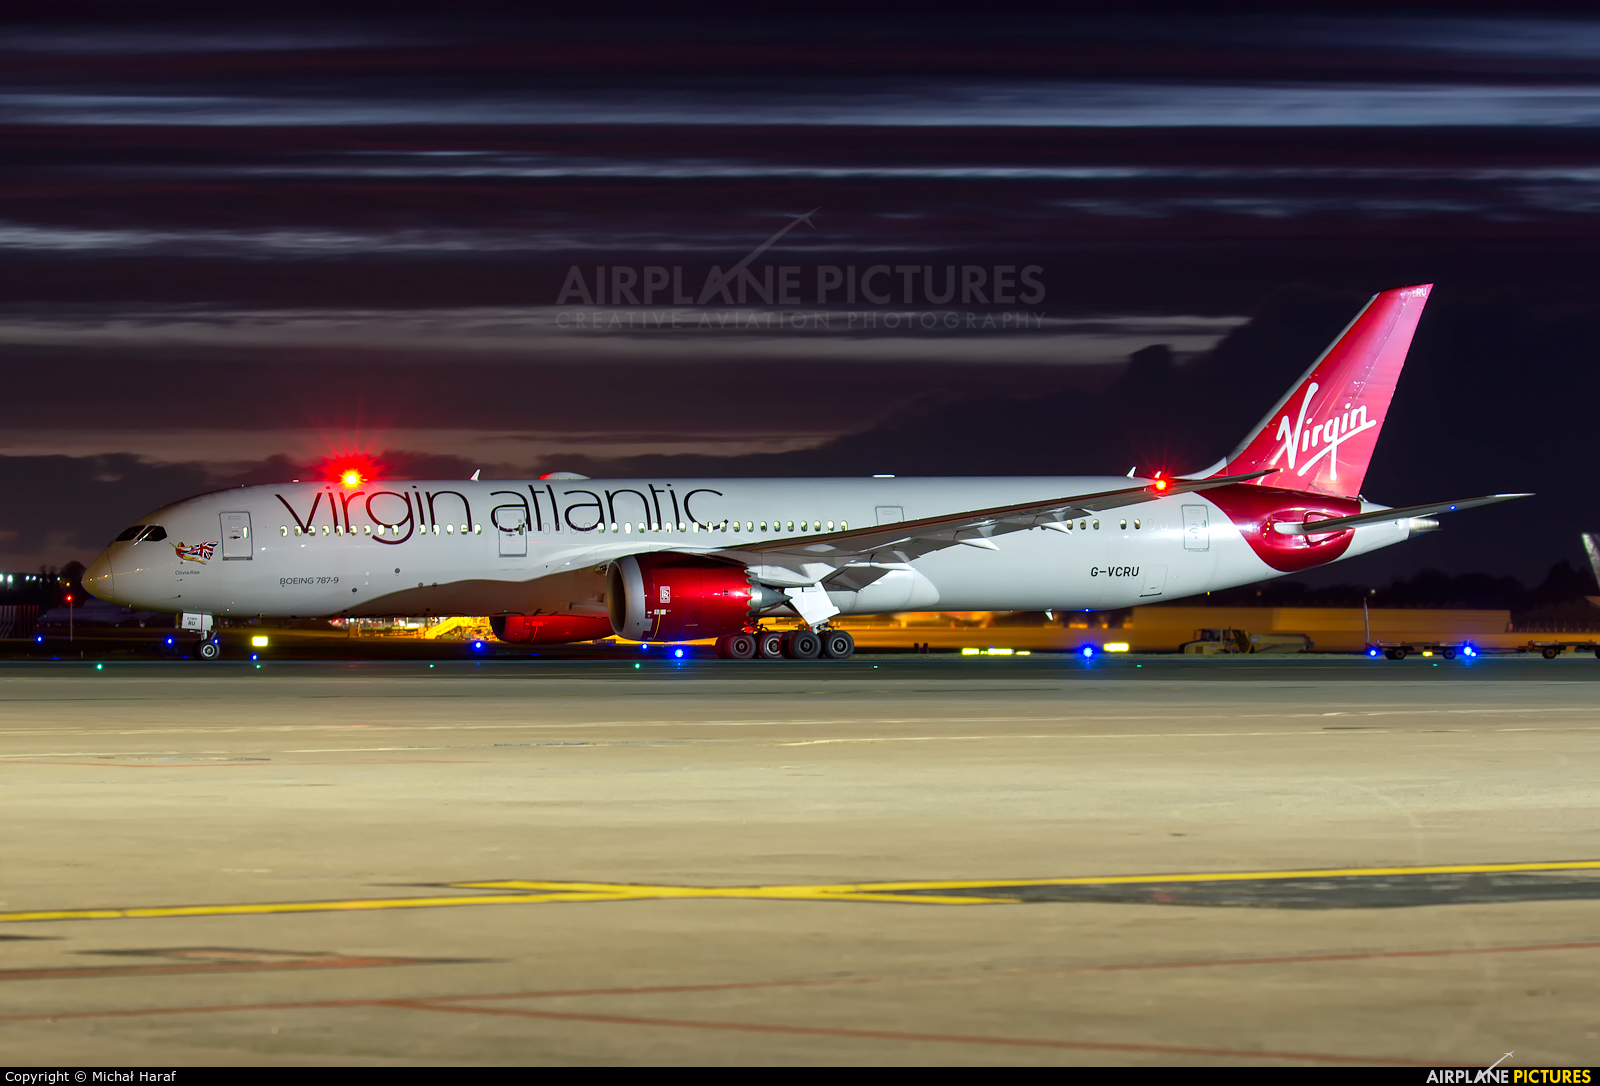 Virgin Atlantic G-VCRU aircraft at Dublin